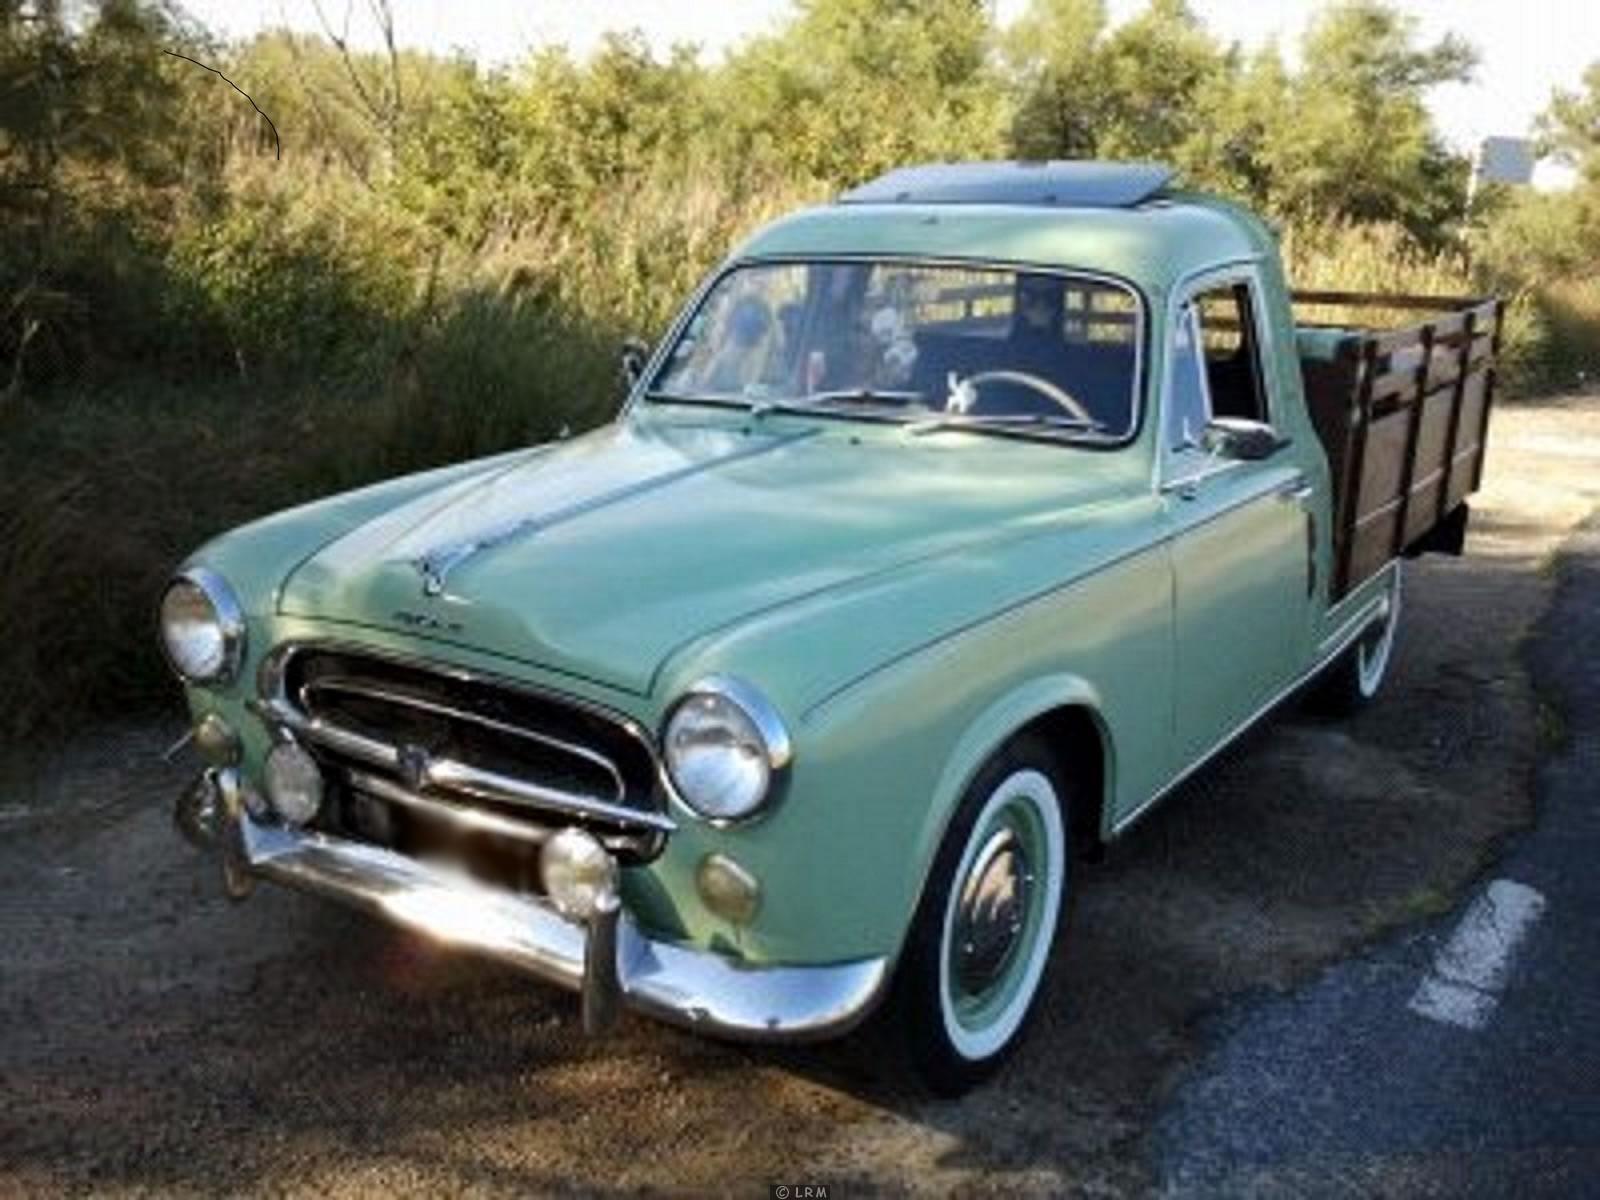 louer une peugeot 403 pick up de 1962 photo 1 voiture pinterest voitures voitures. Black Bedroom Furniture Sets. Home Design Ideas